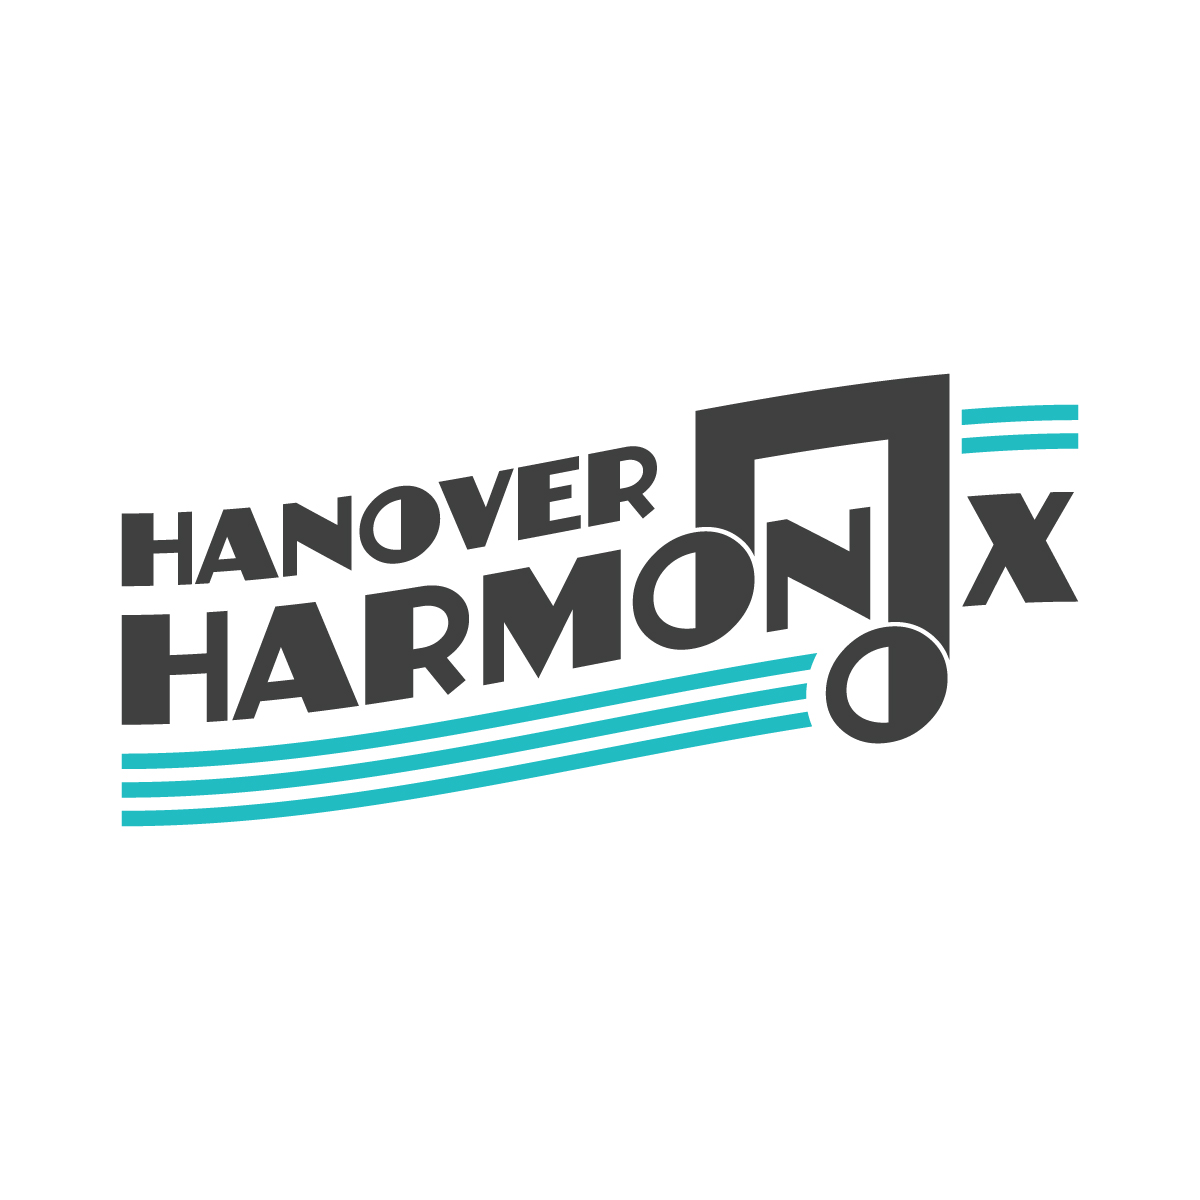 hanover harmonics-01.jpg